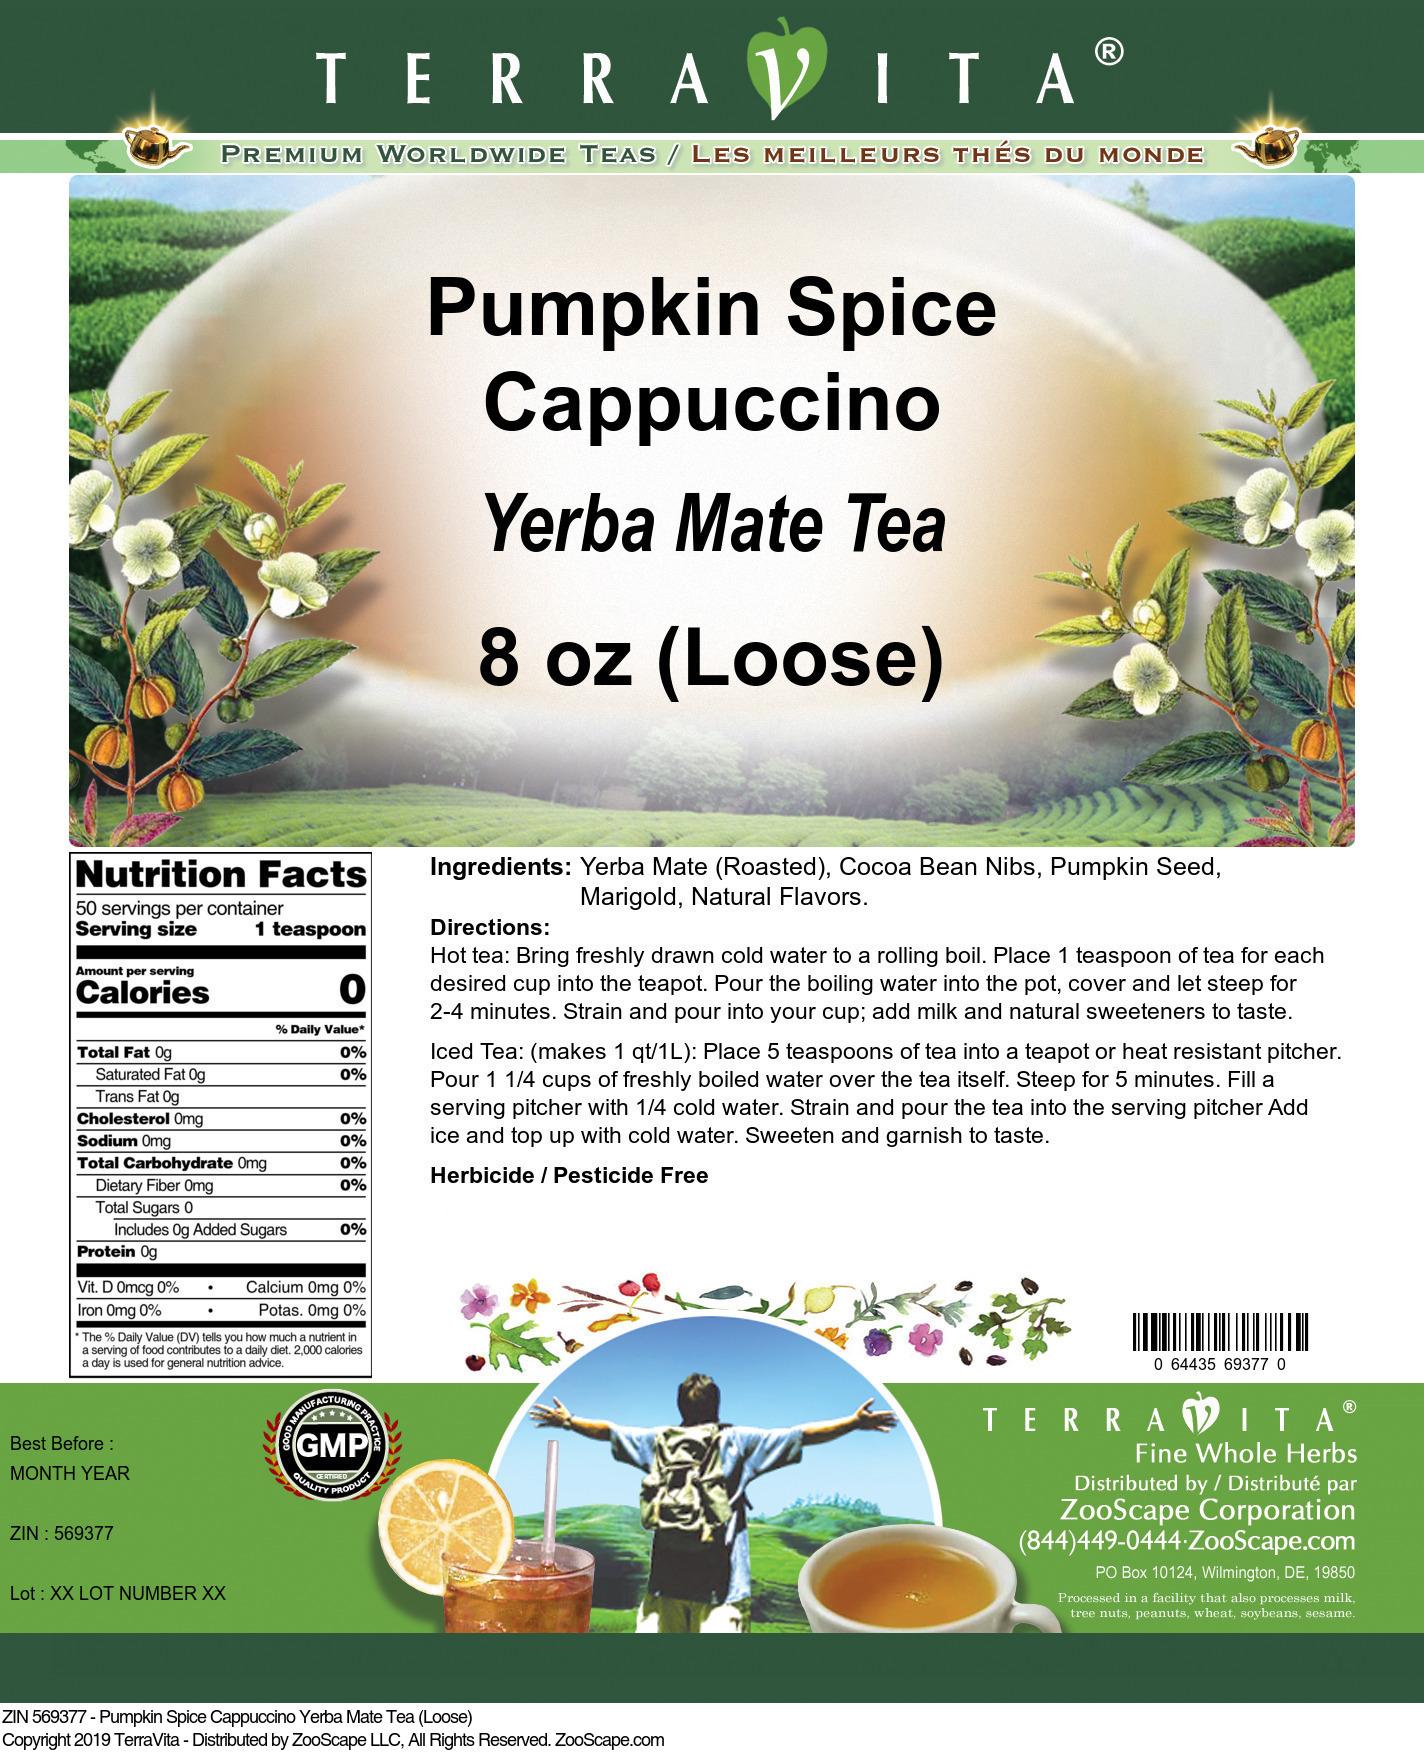 Pumpkin Spice Cappuccino Yerba Mate Tea (Loose)